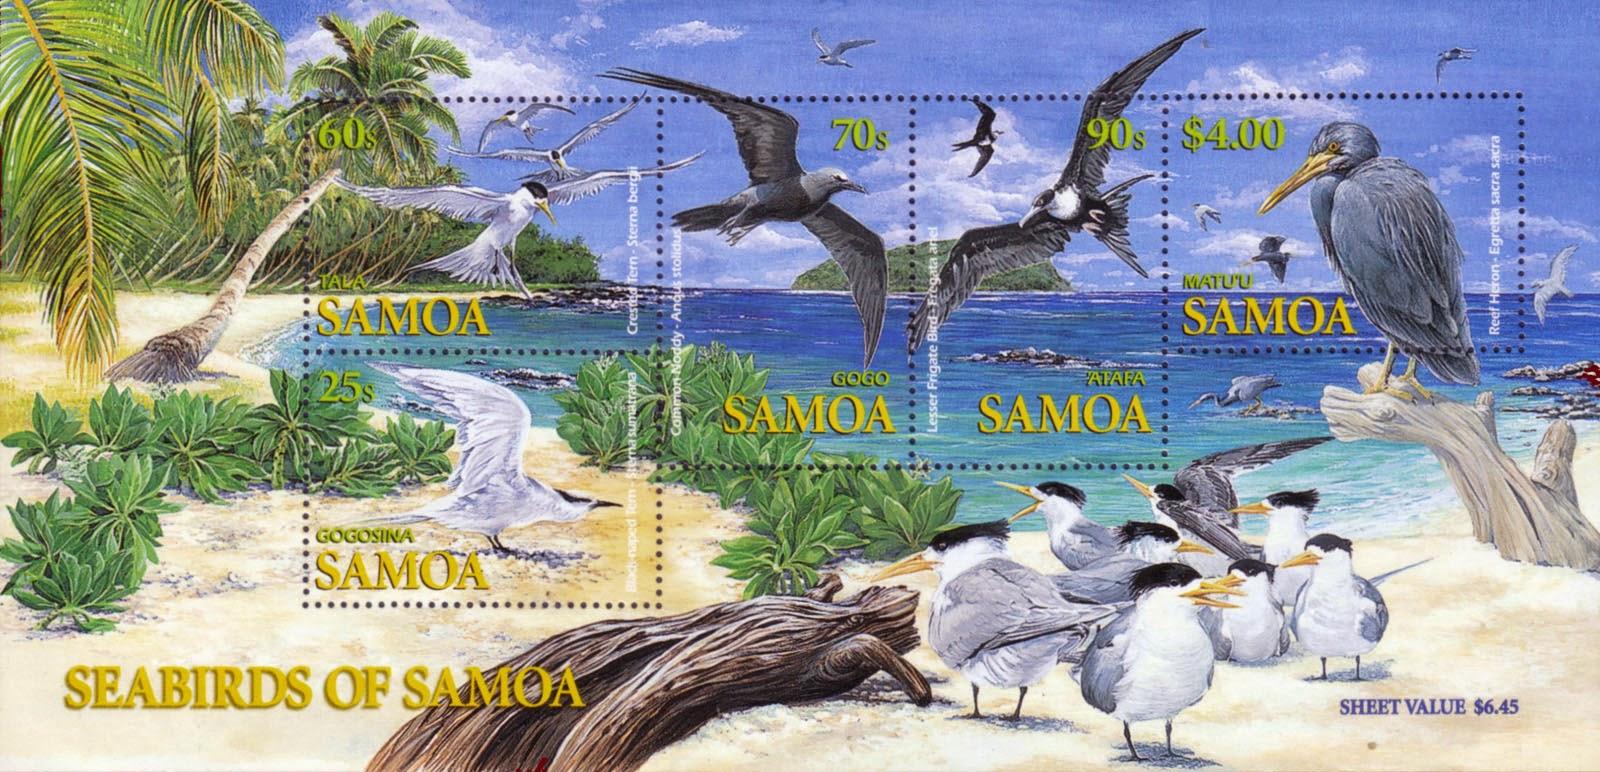 Samoa 2004 Seabirds of Samoa Miniature Sheet